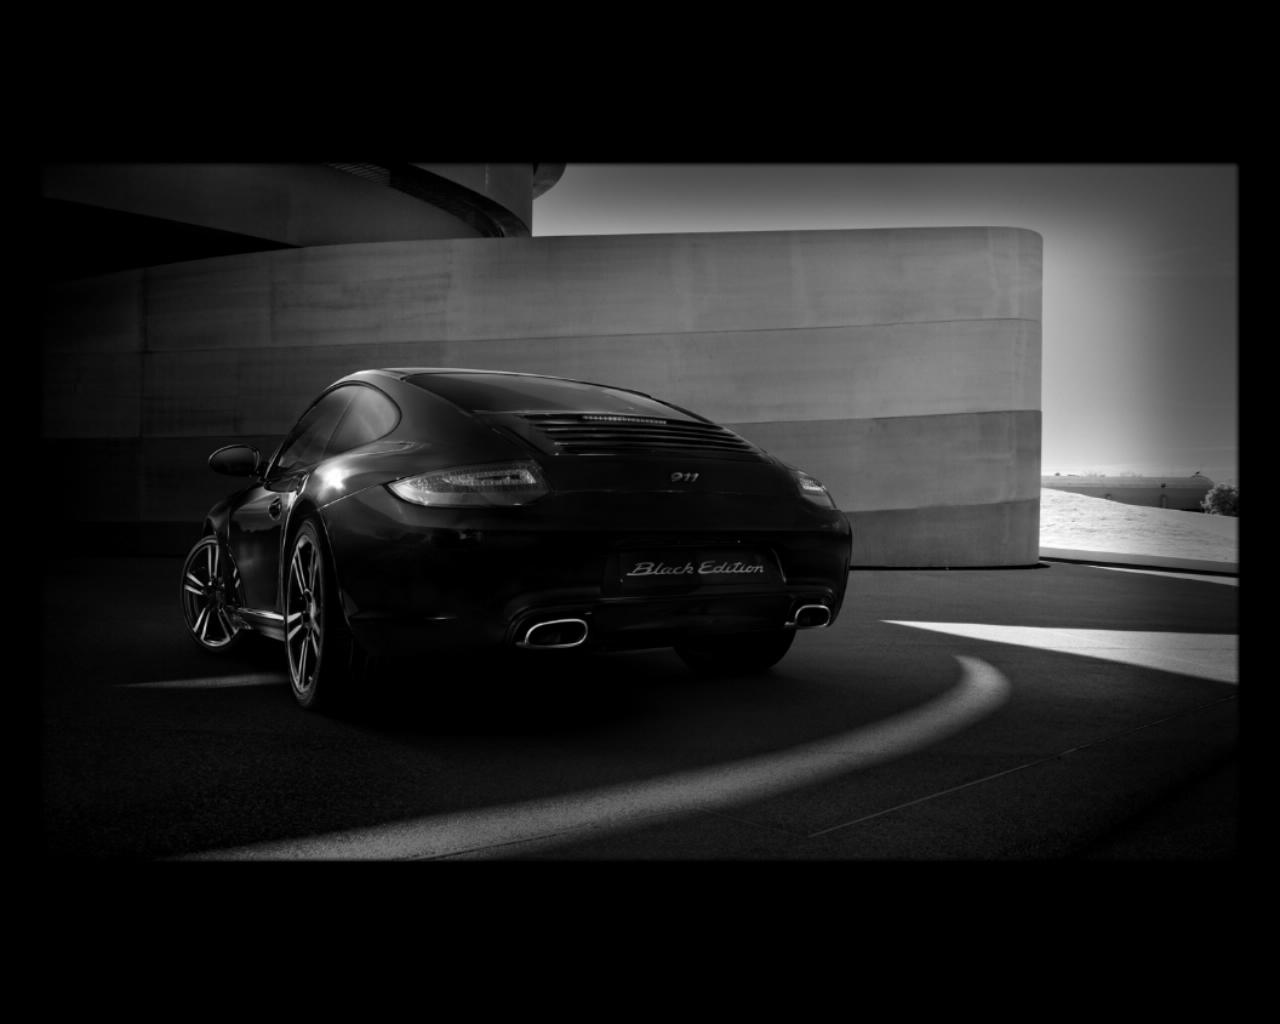 2011 Porsche 911 Black Edition